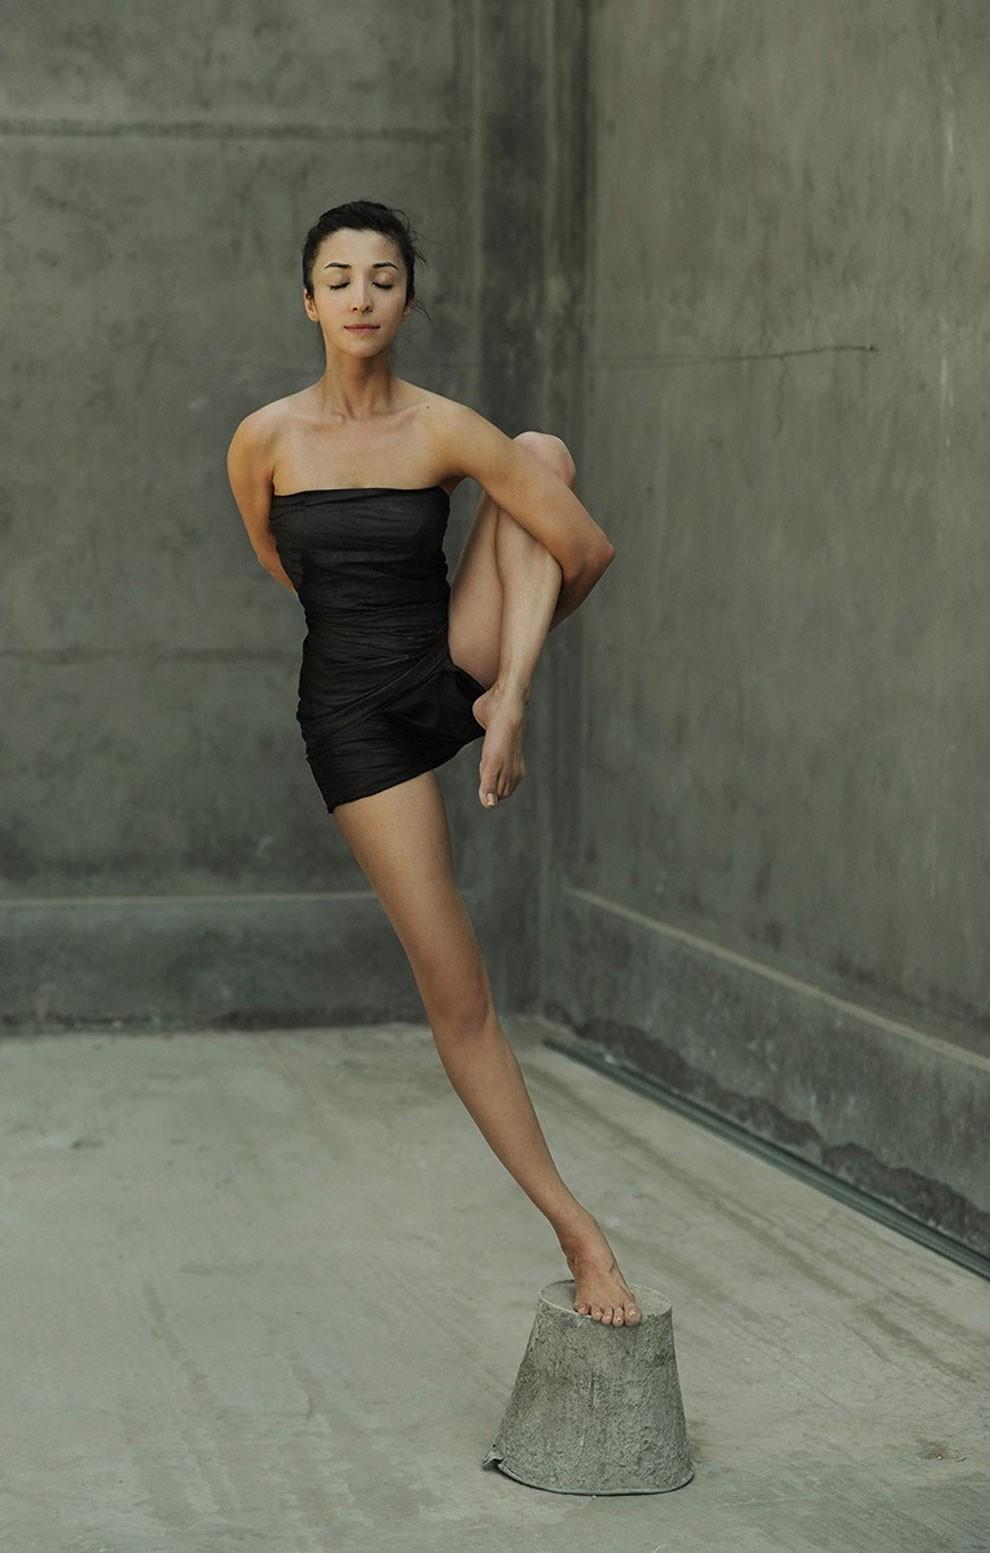 fotografia-surreale-leggerezza-donne-ravshaniya-azoulay-20